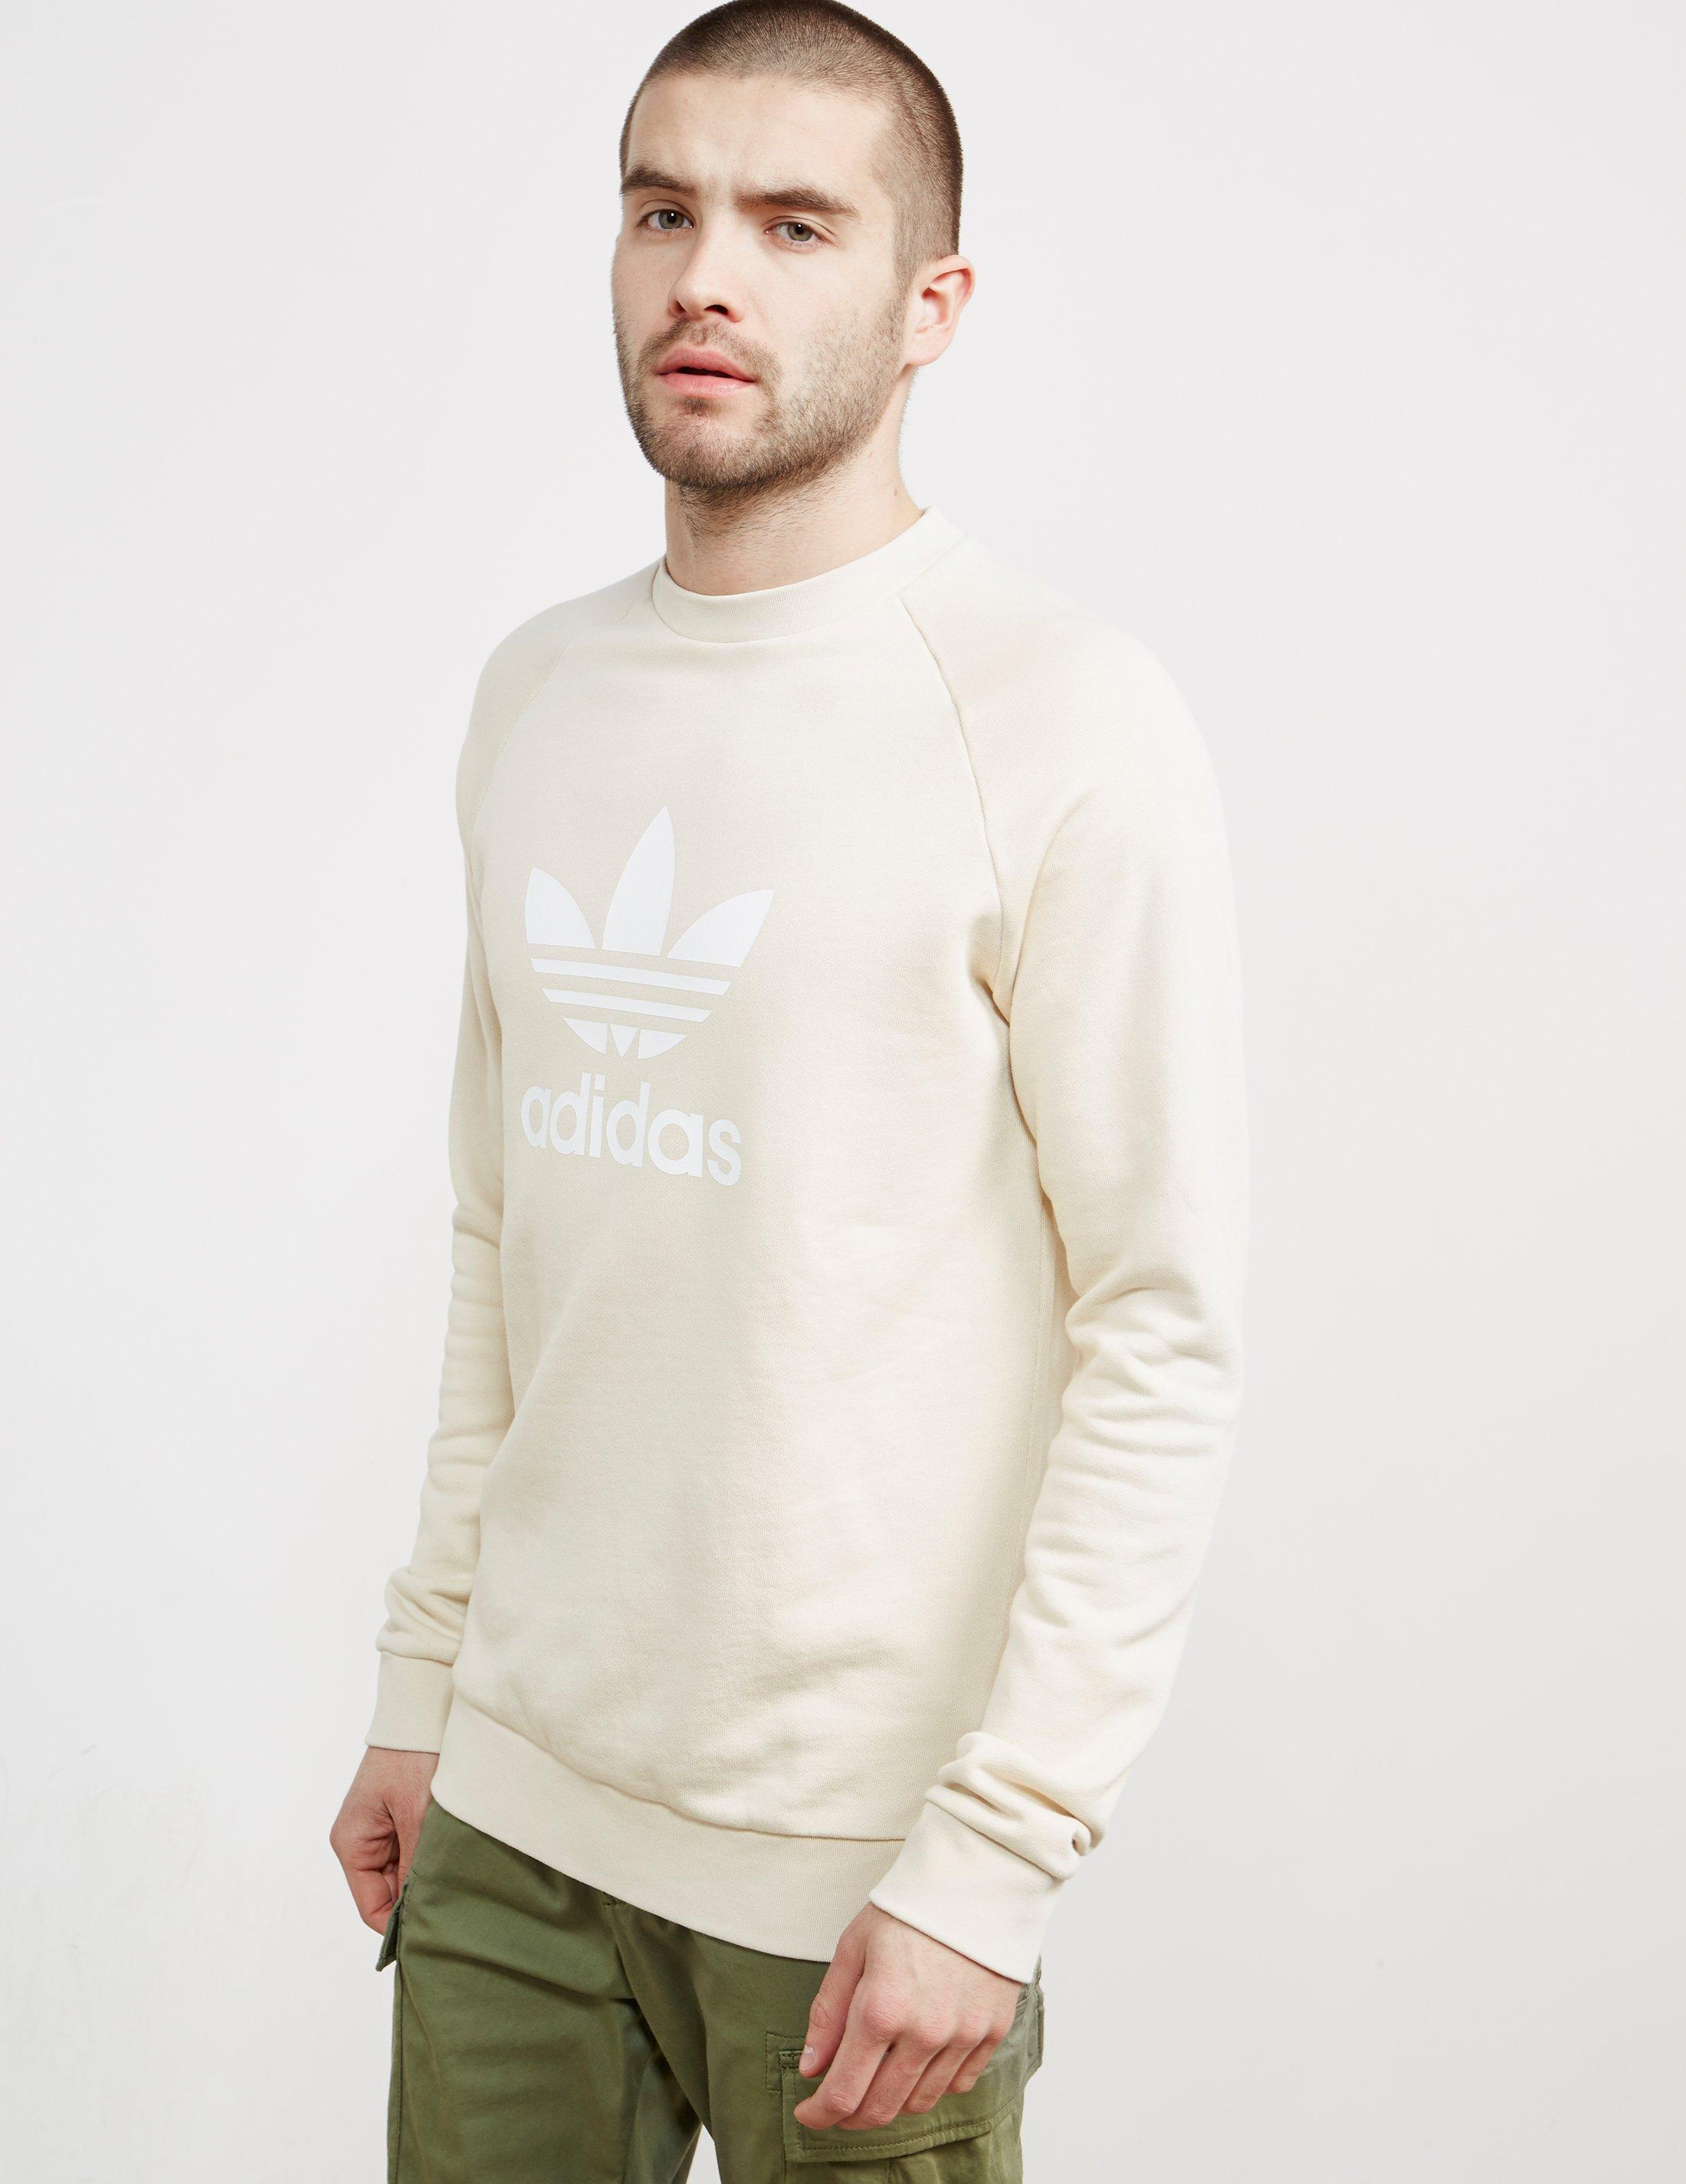 Adidas Originals Multicolor Mens Trefoil Crew Sweatshirt Linen for men